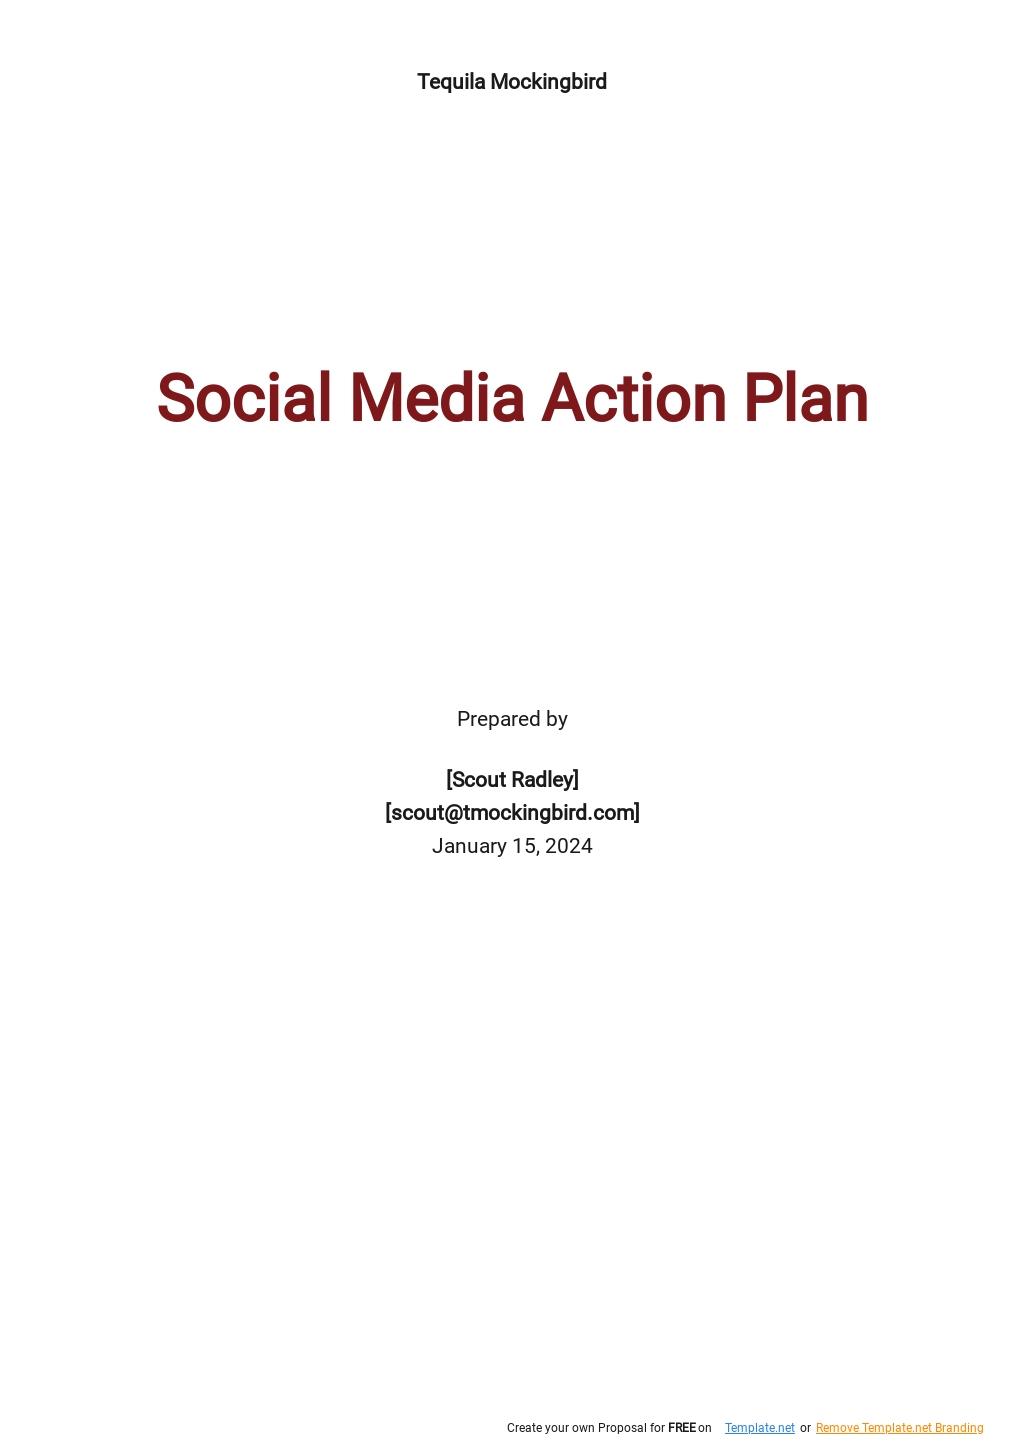 Social Media Action Plan Template.jpe